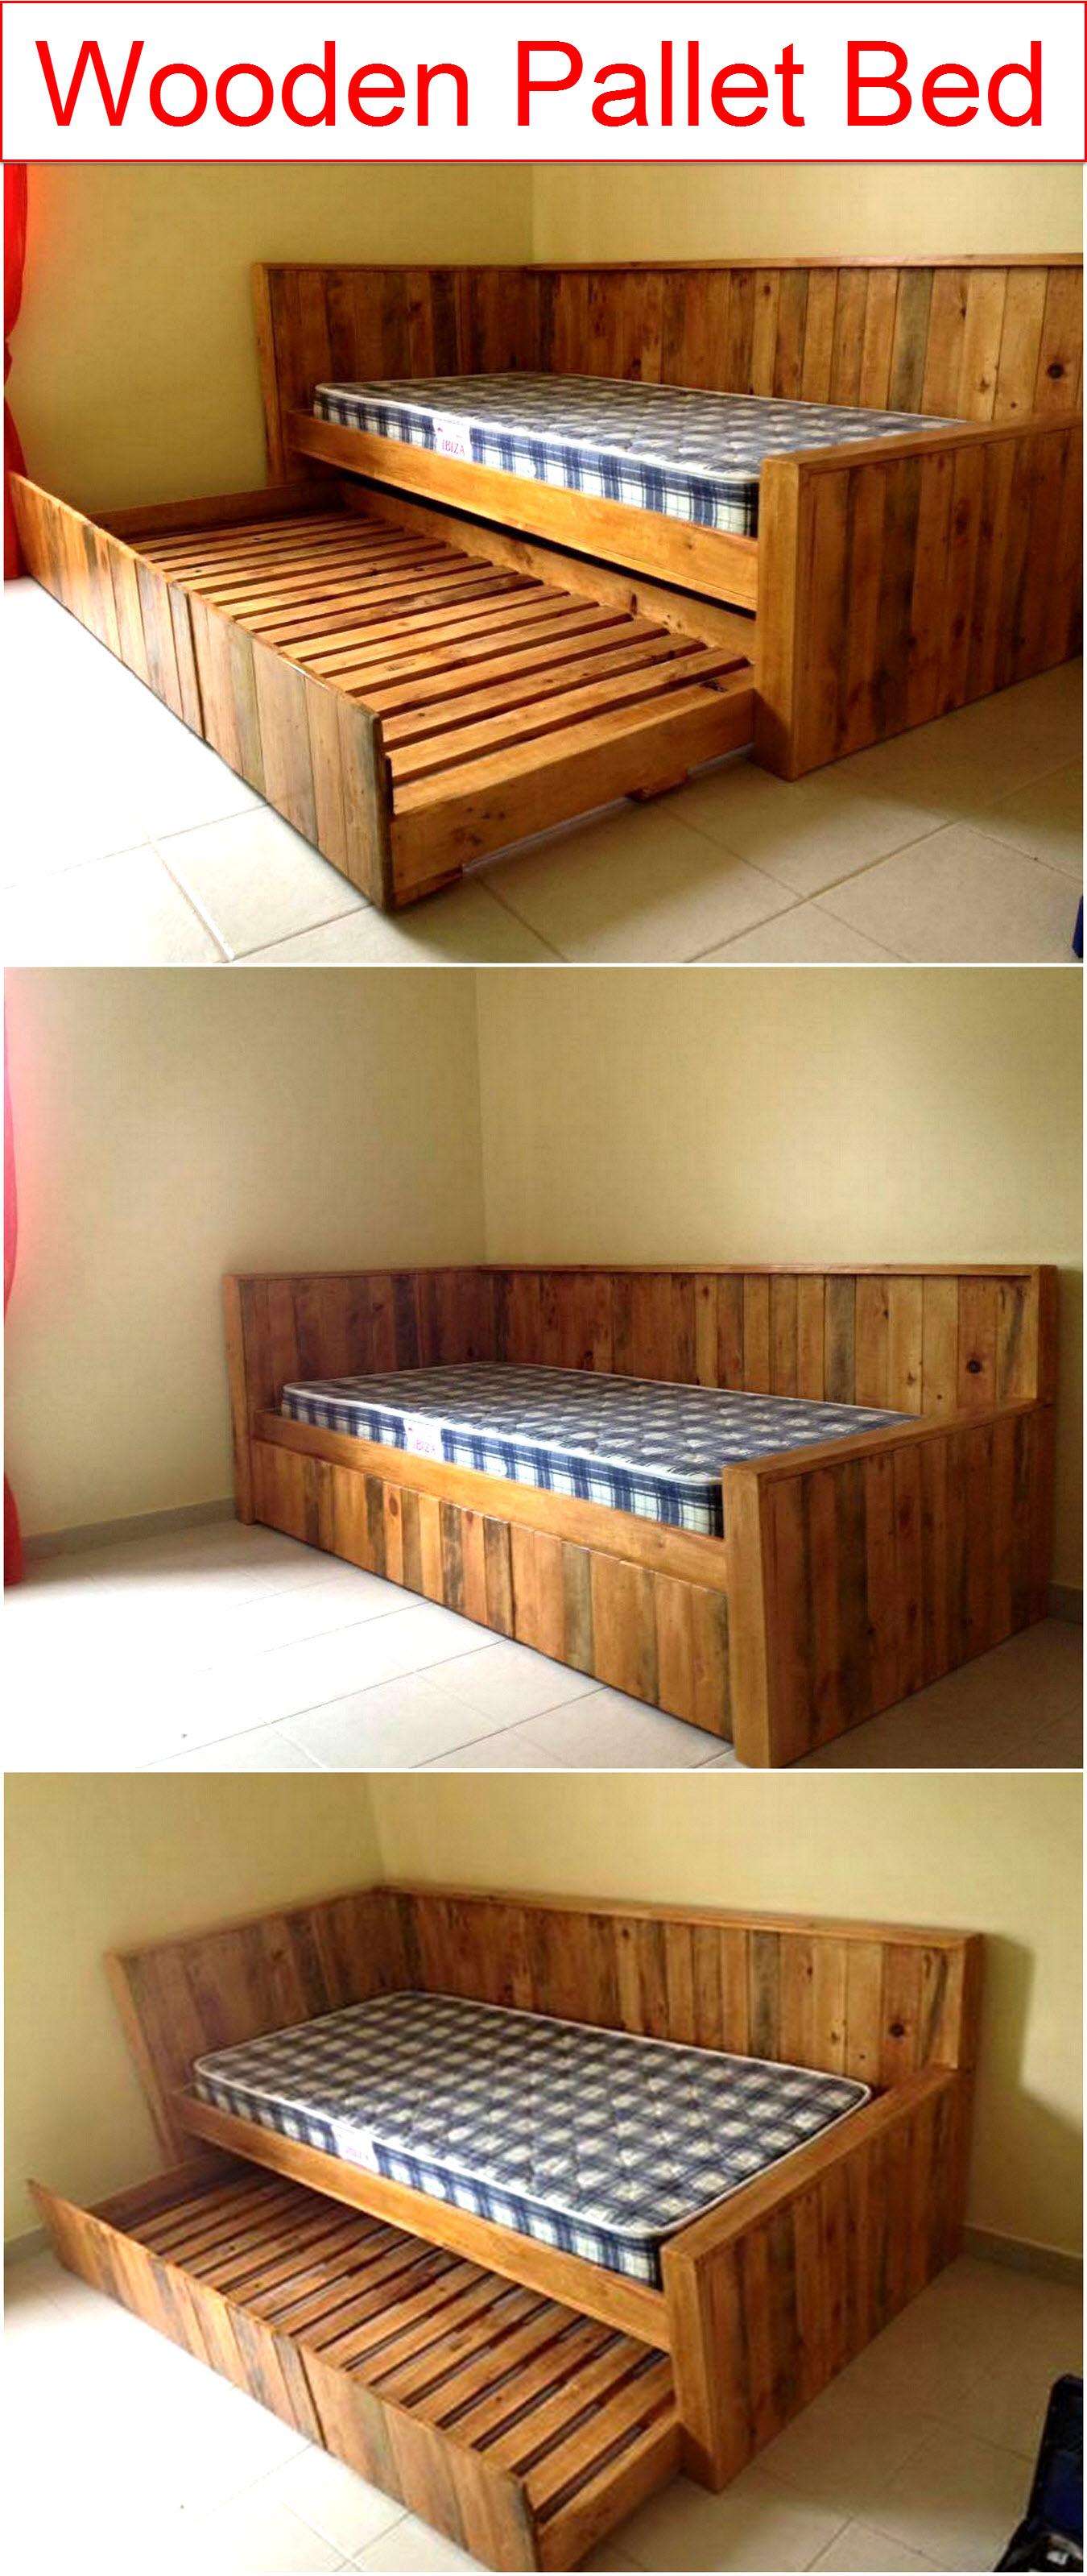 wooden-pallet-bed